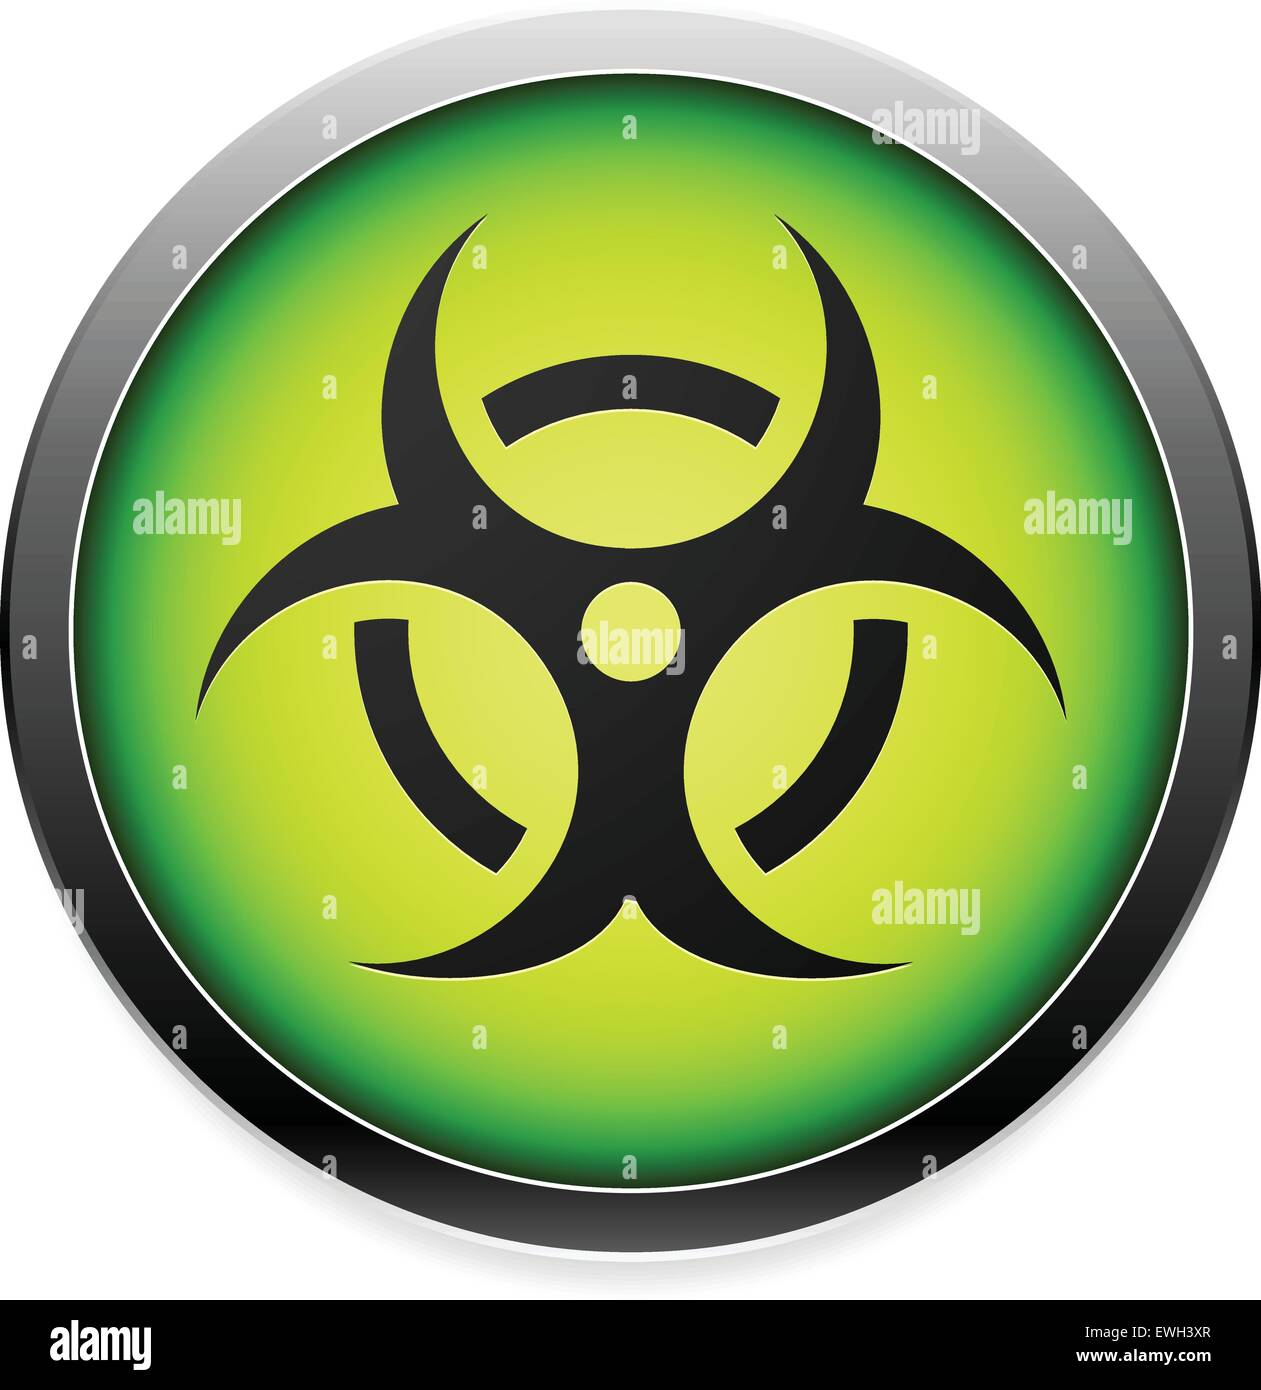 Quarantine Contamination Bio Hazard Symbol Sign Icon In Green